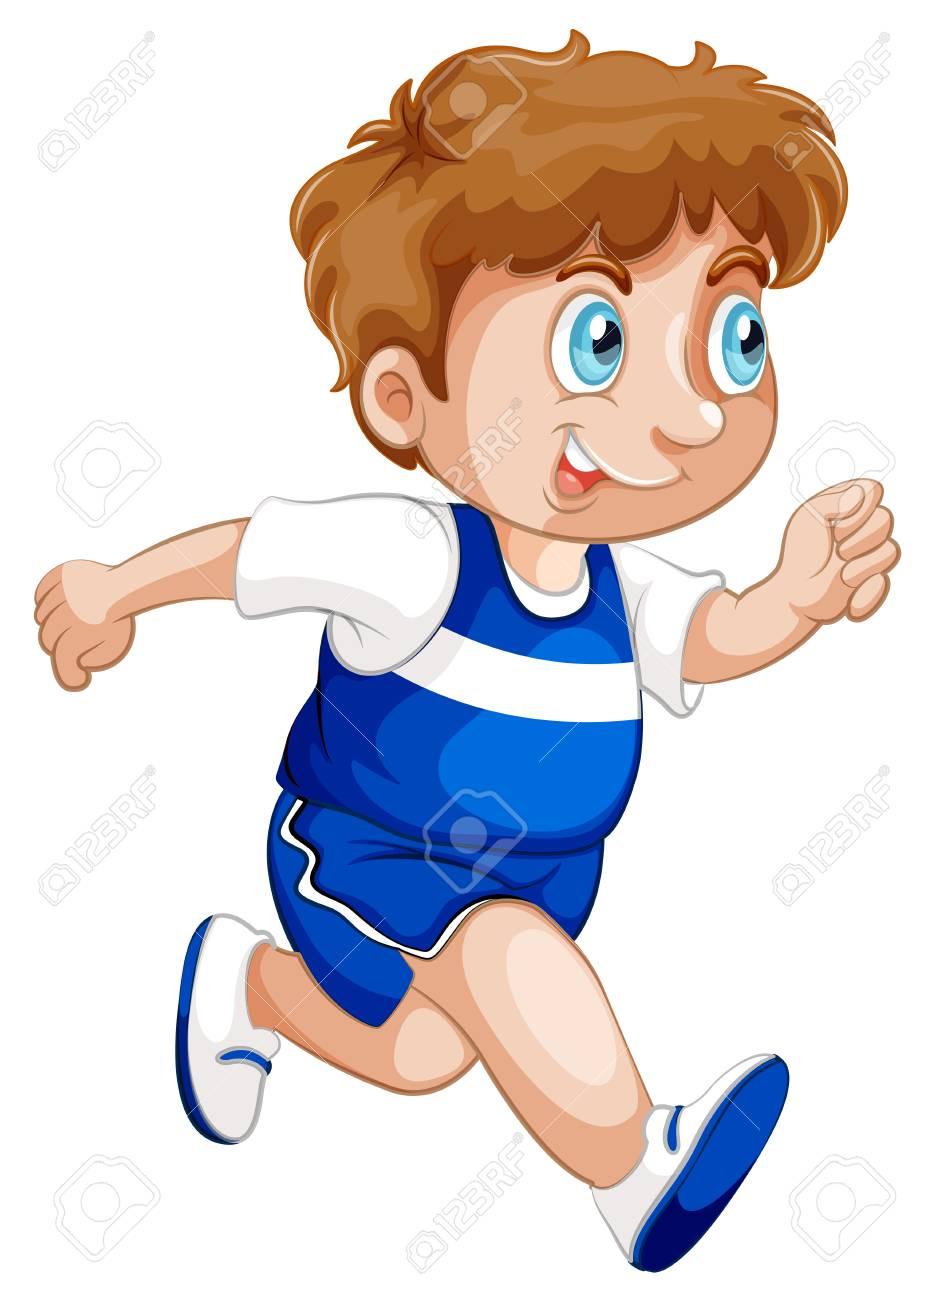 A boy running character illustration - 125275454